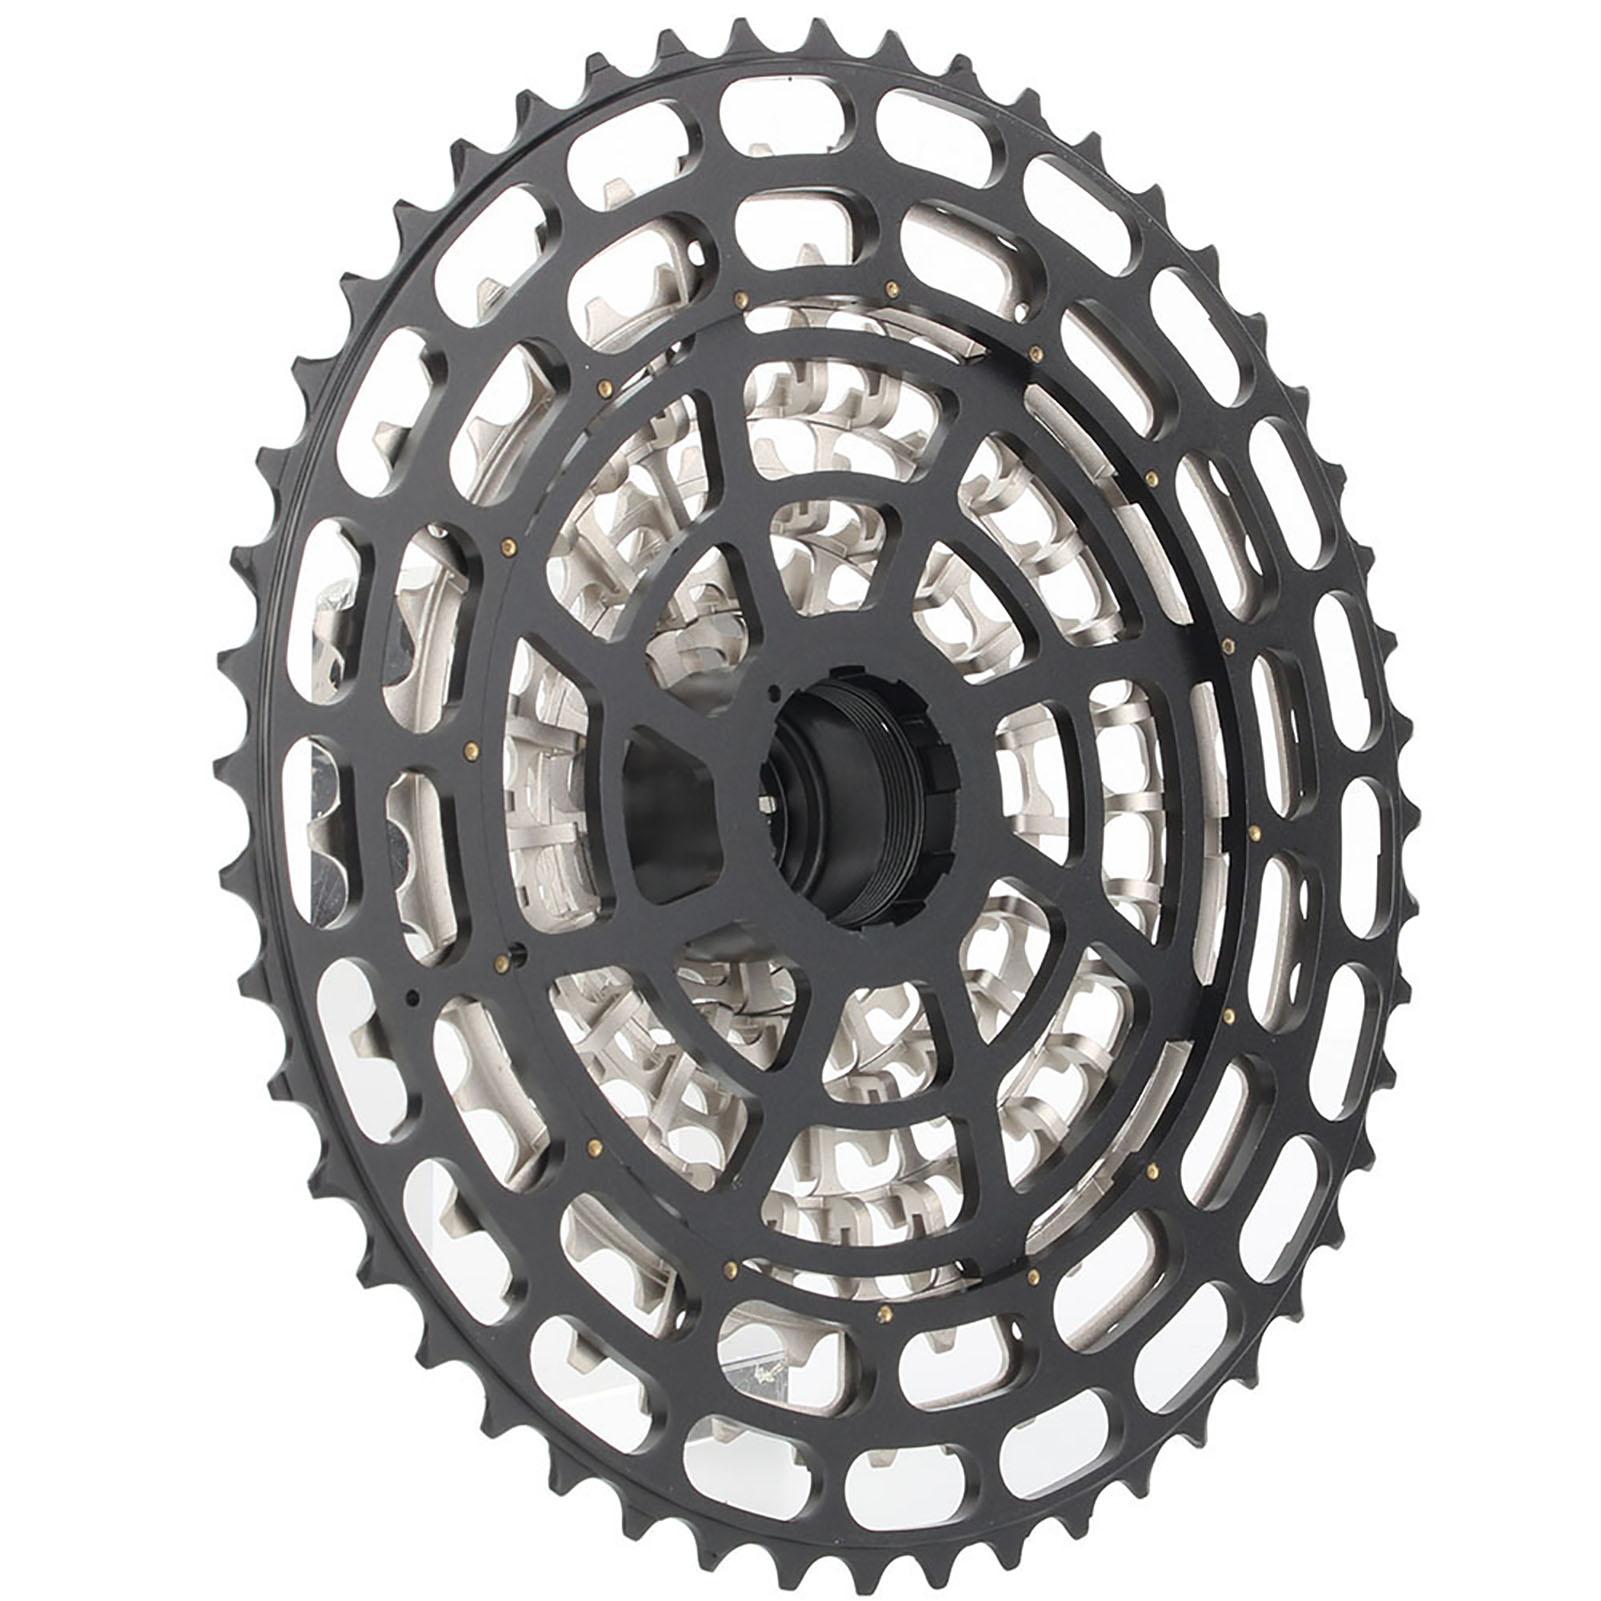 ZTTO-12-Speed-Cassette-10-50T-11-50T-Freewheel-Mountain-Bike-Sprocket-Compatible thumbnail 13